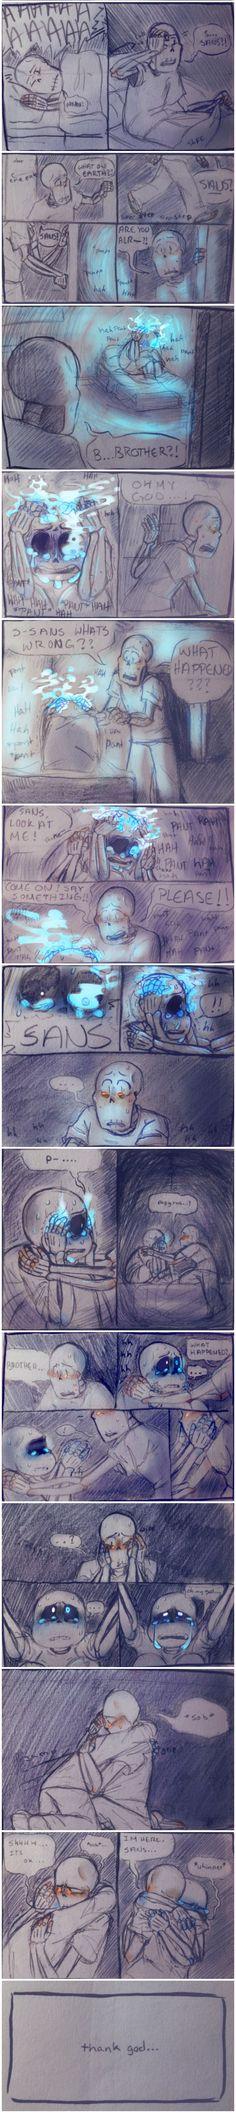 Sans and Papyrus - Night Terrors 2/2 #comic